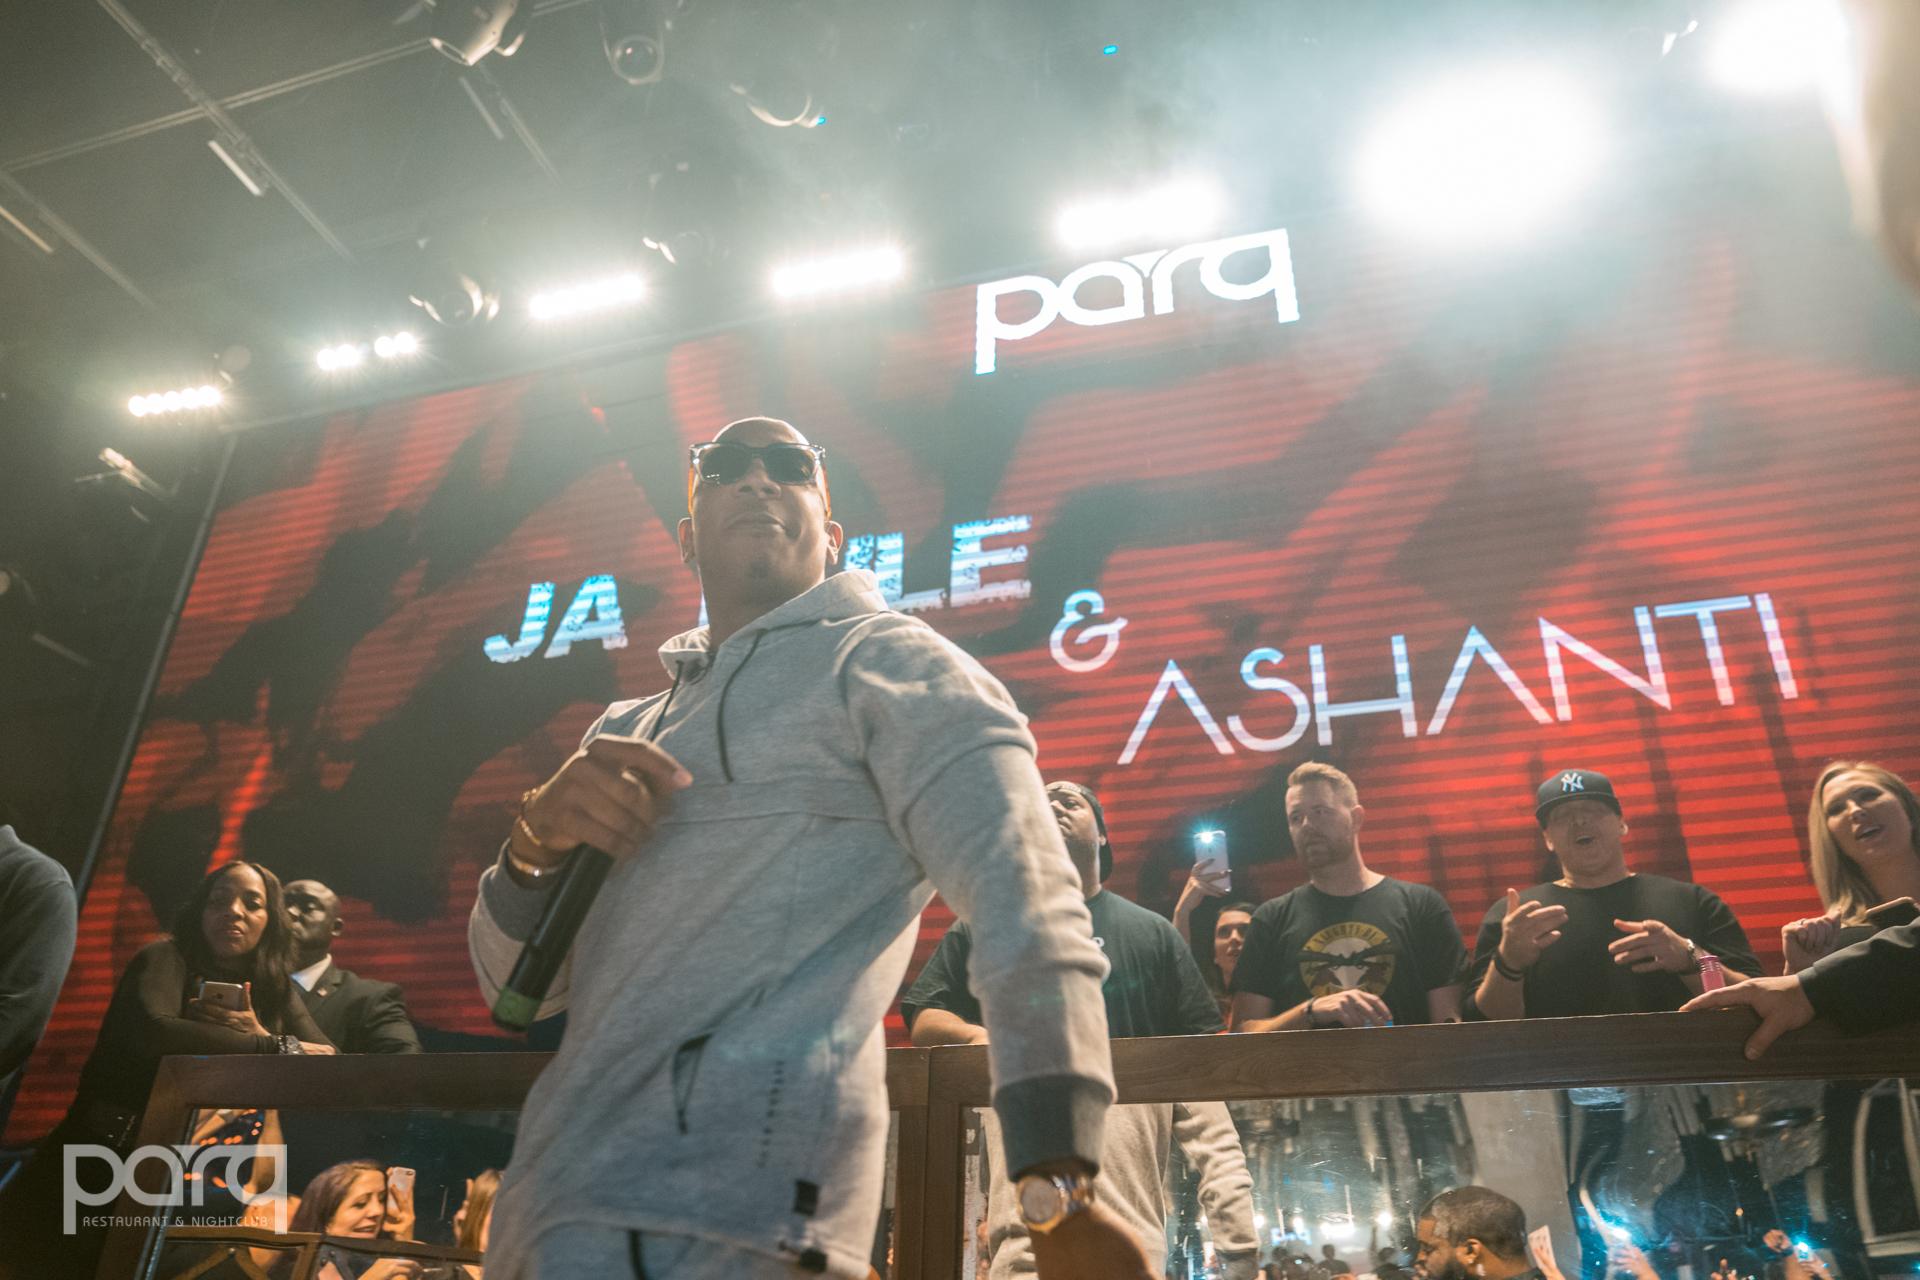 02.09.18 Parq - JaRule-Ashanti-14.jpg